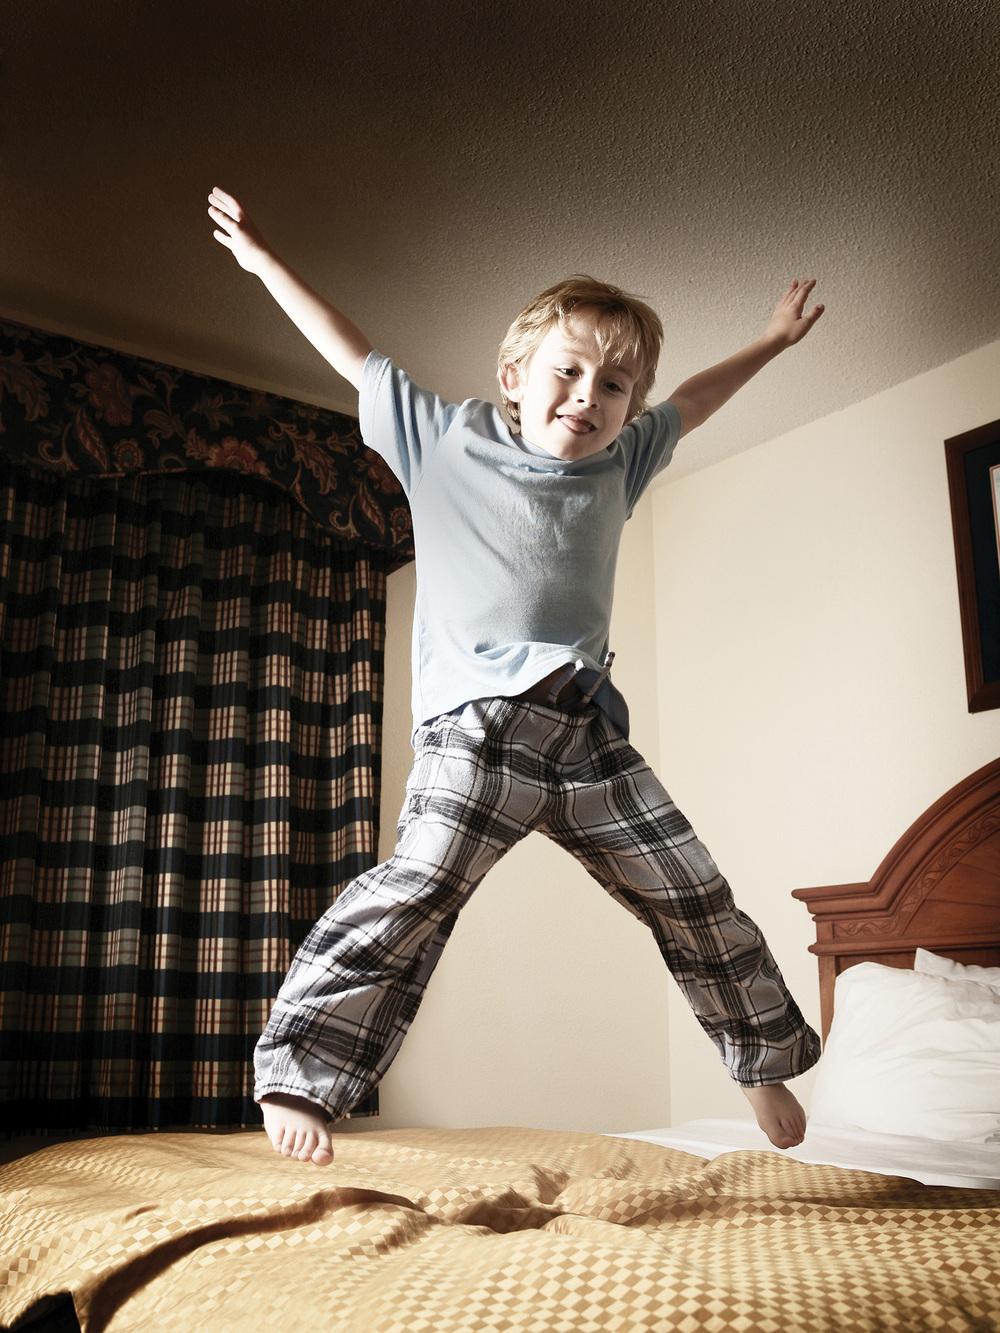 boy_jumping_cover_1500px_mod2.jpg